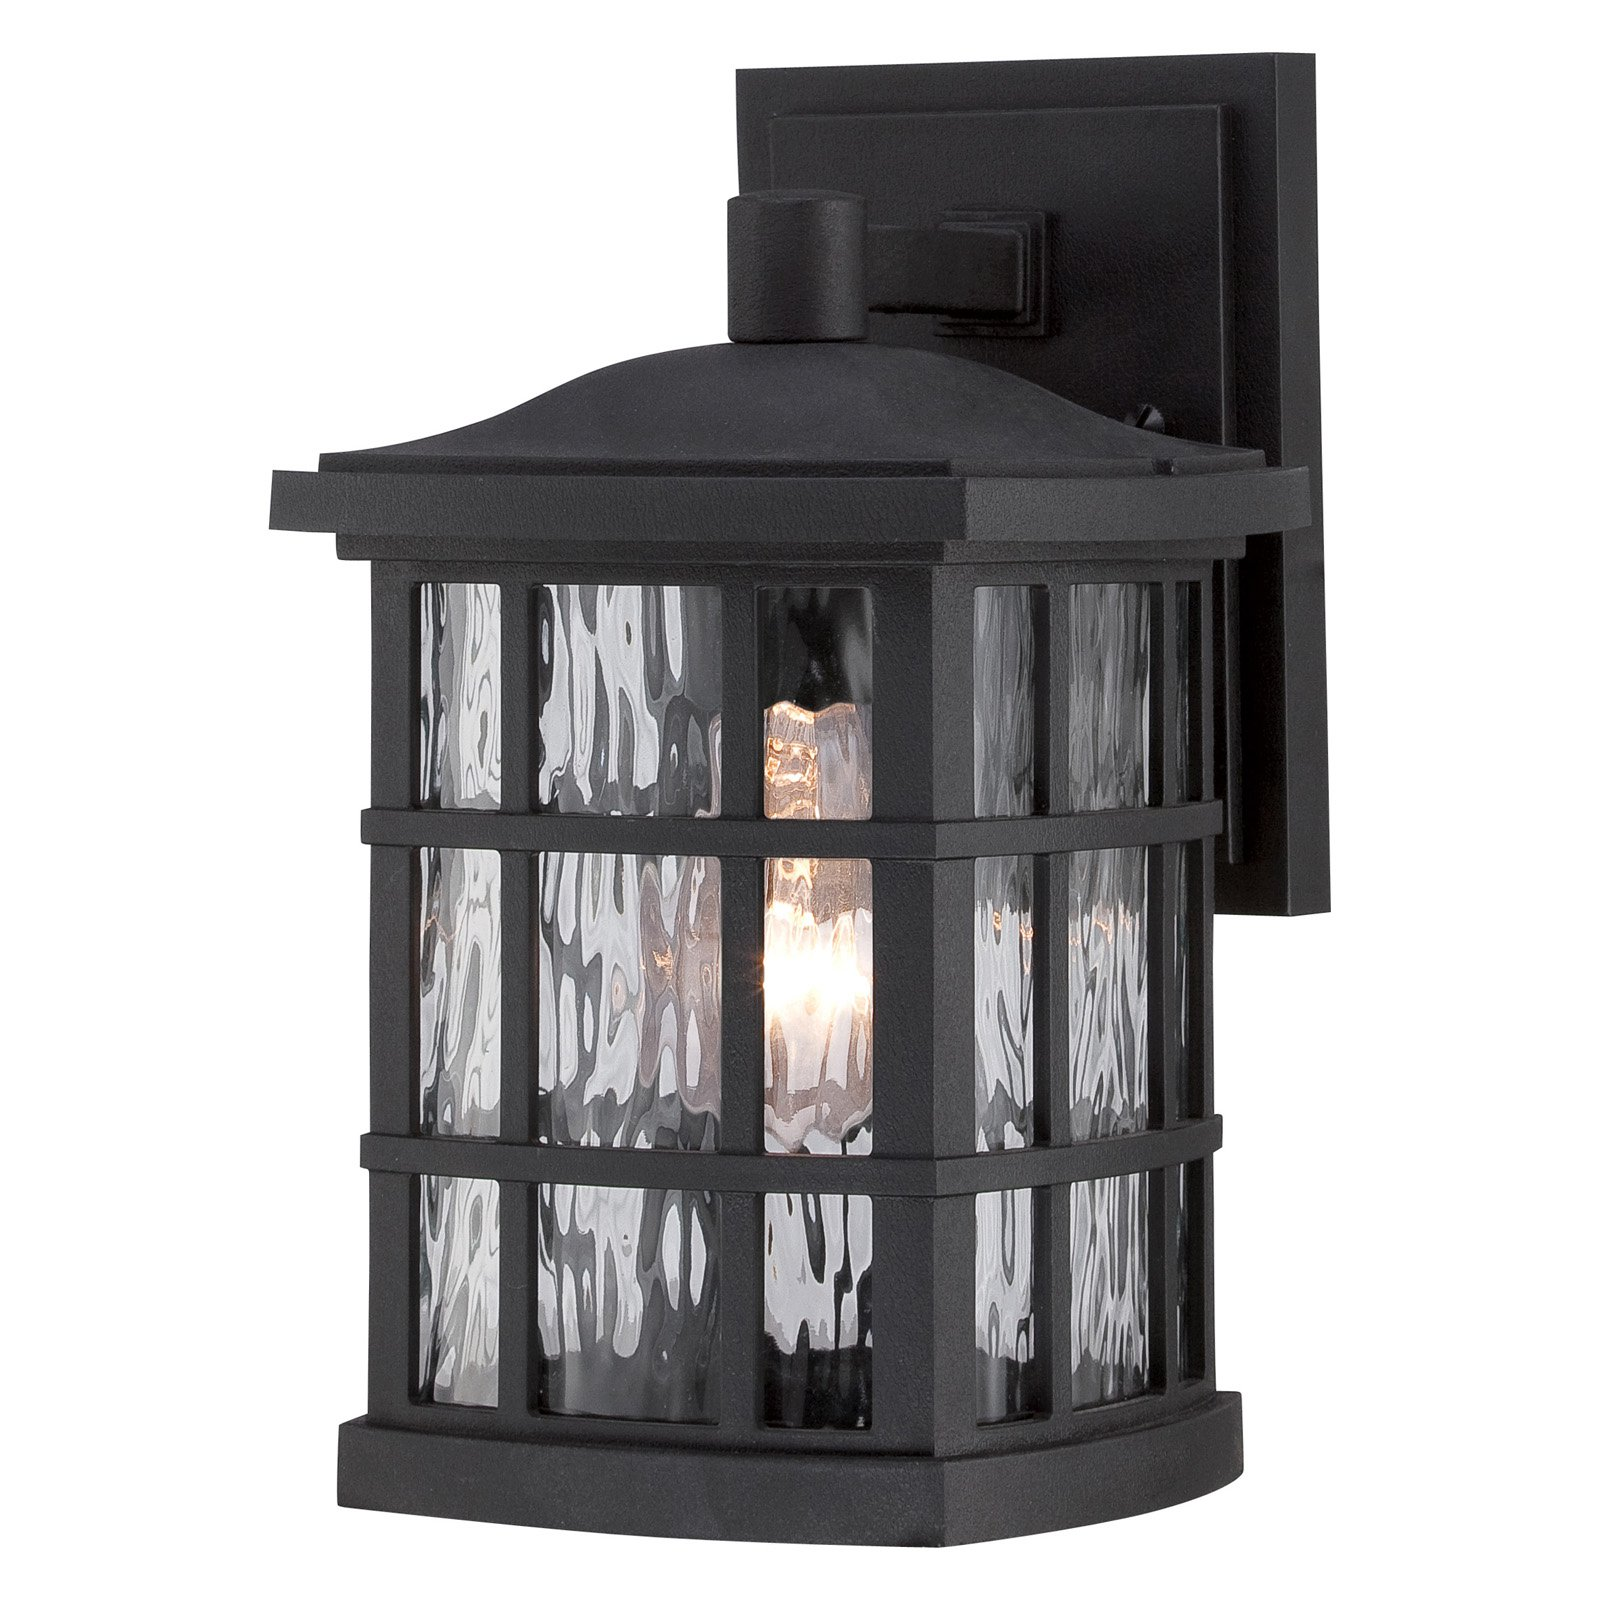 Quoizel Stonington SNN8406 Outdoor Wall Lantern